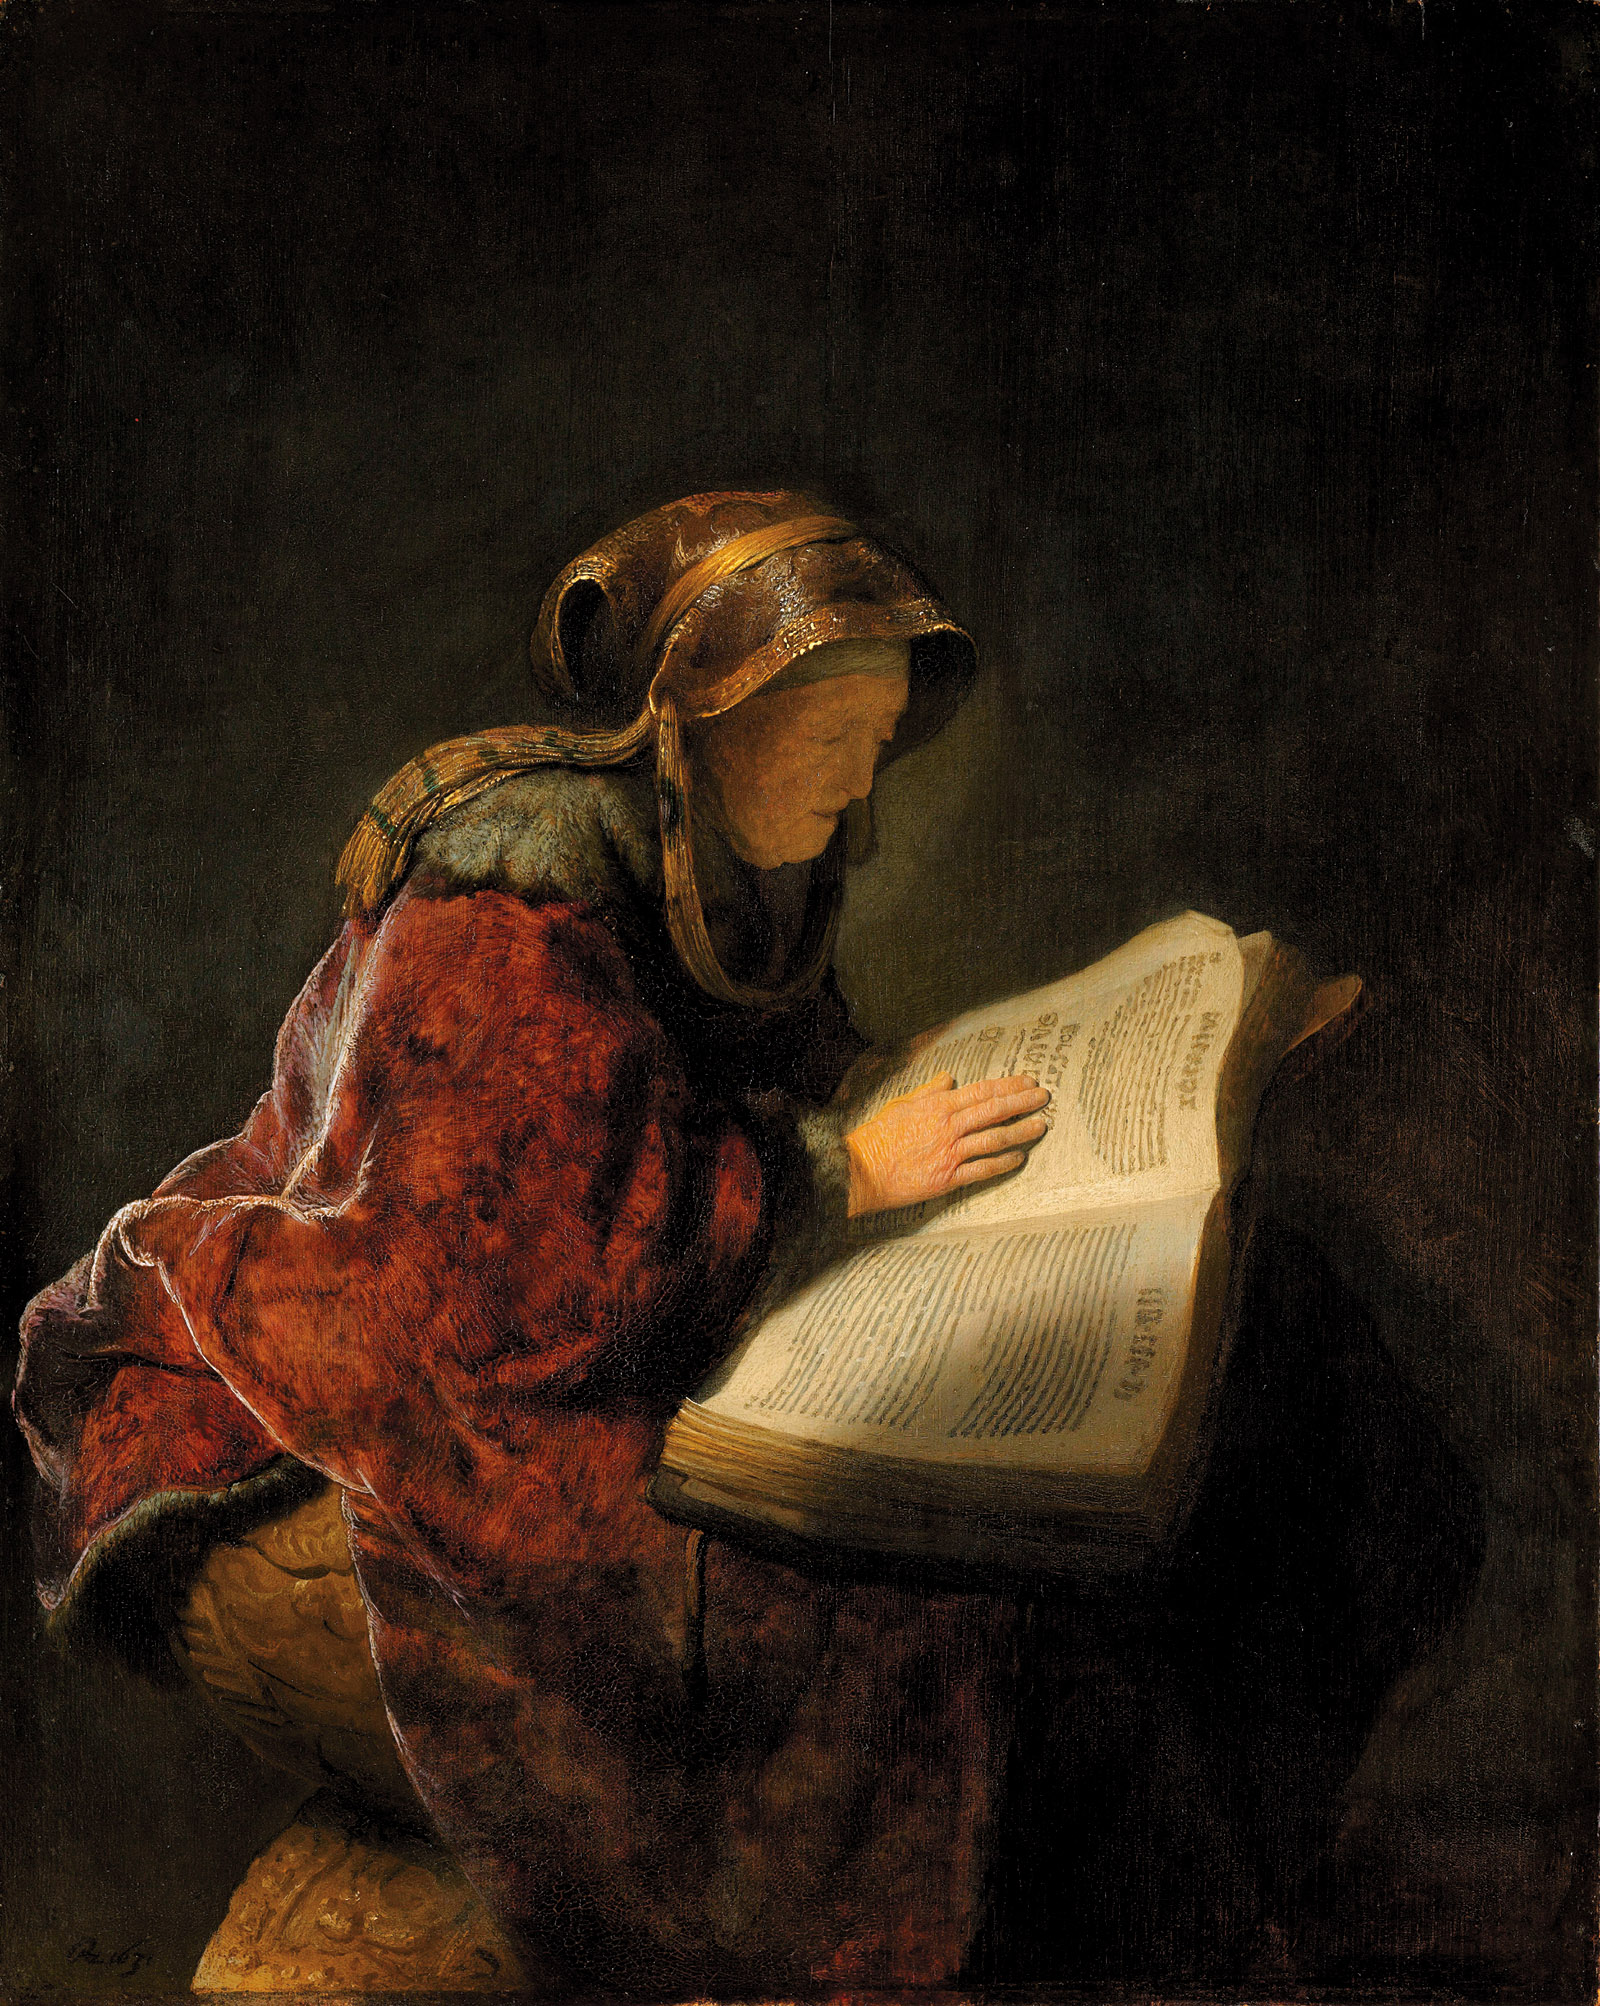 Rembrandt van Rijn: Old Woman Reading, 1631